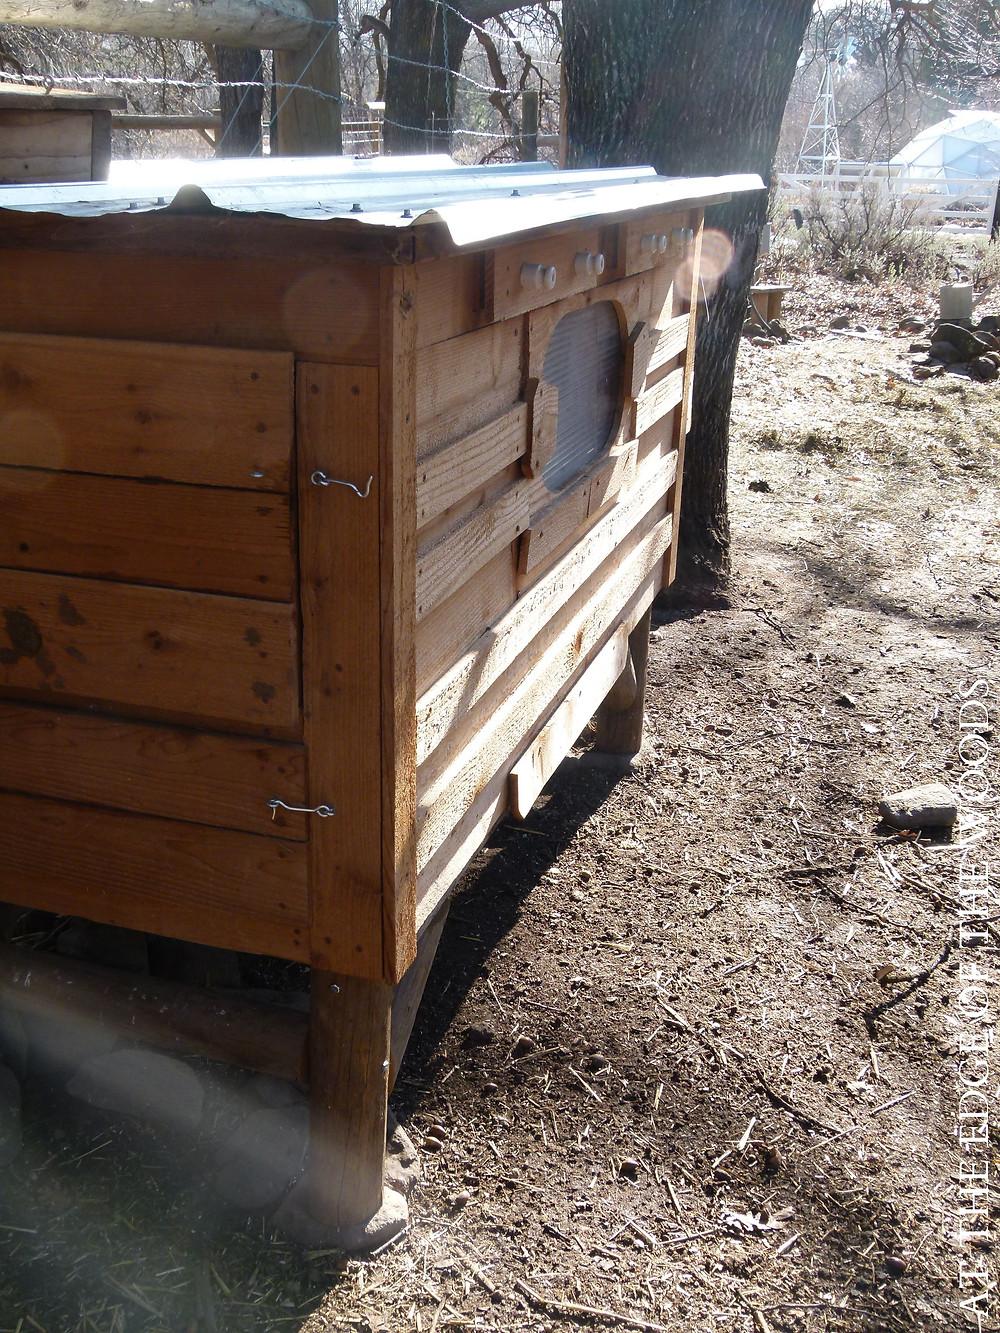 the second chicken coop